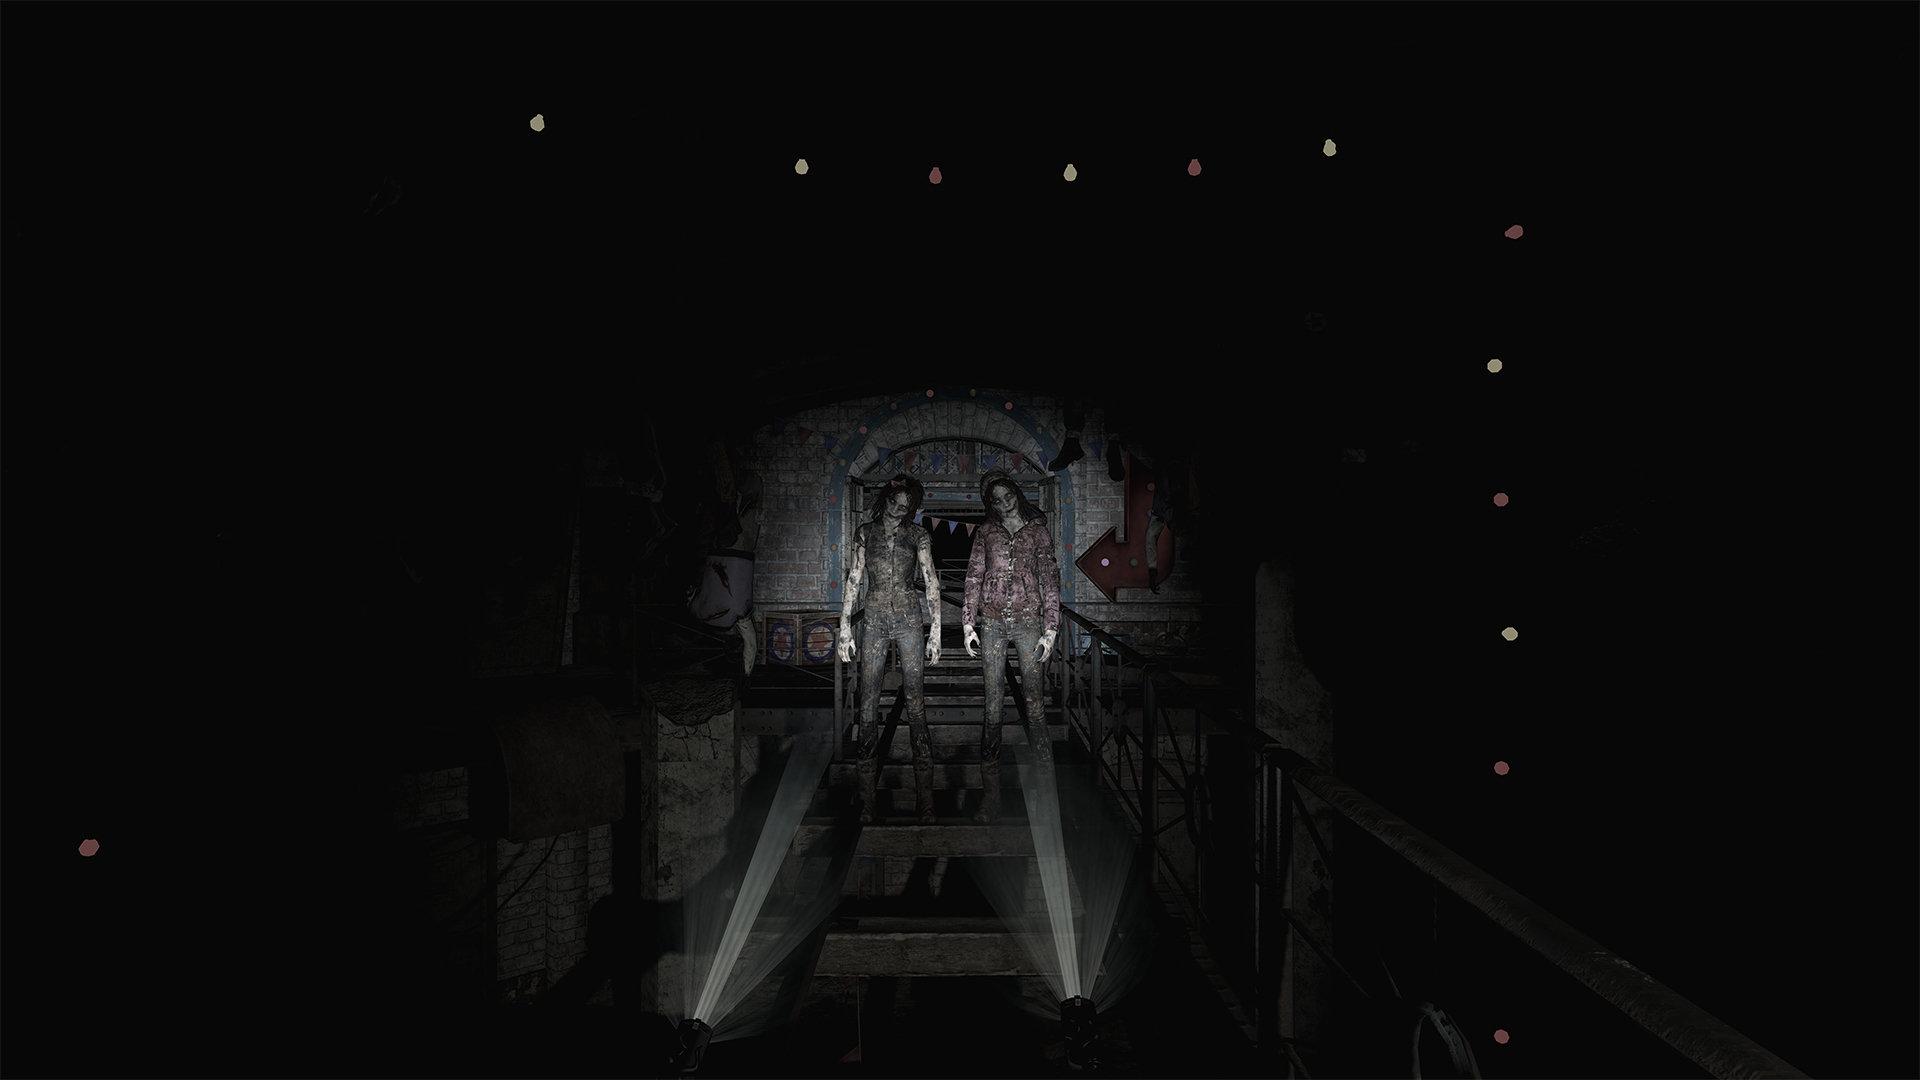 until-dawn-rush-of-blood-screen-06-ps4-eu-15mar16